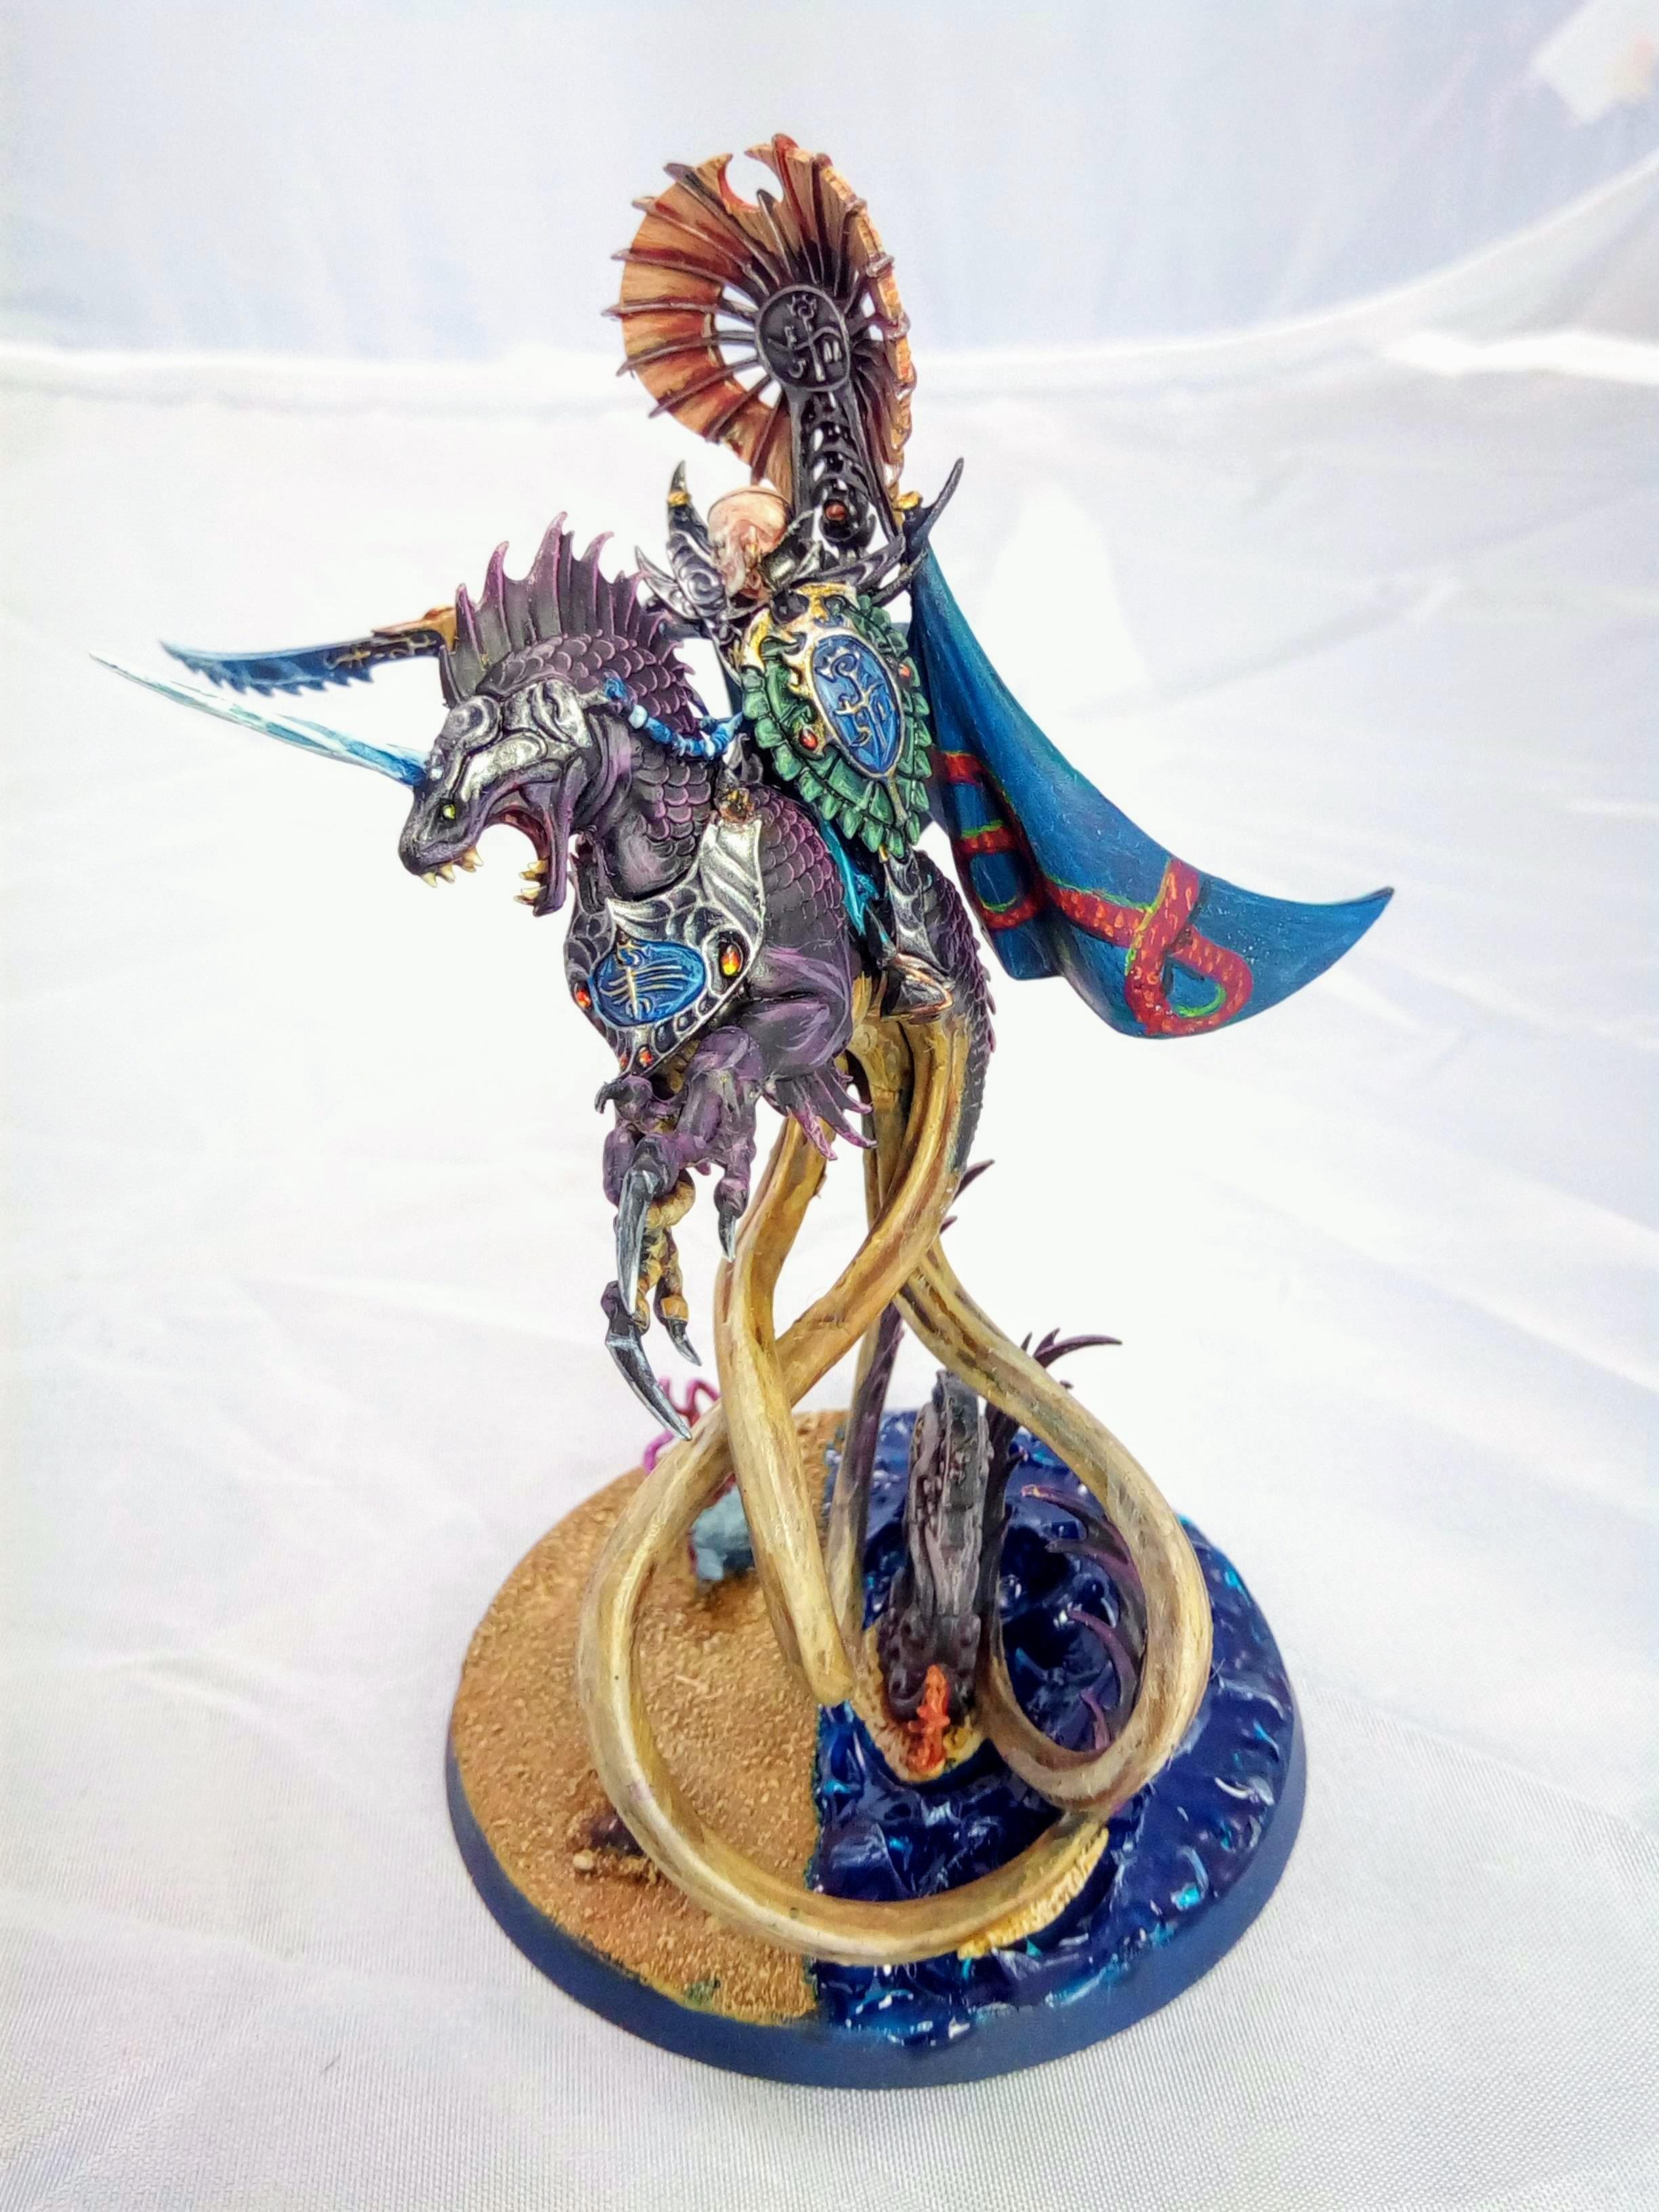 Aelf, Age Of Sigmar, Beach, Character, Dragon, Elves, Freehand, Idoneth Deepkin, Ionrach, Mounted, Sea Base, Volturnos